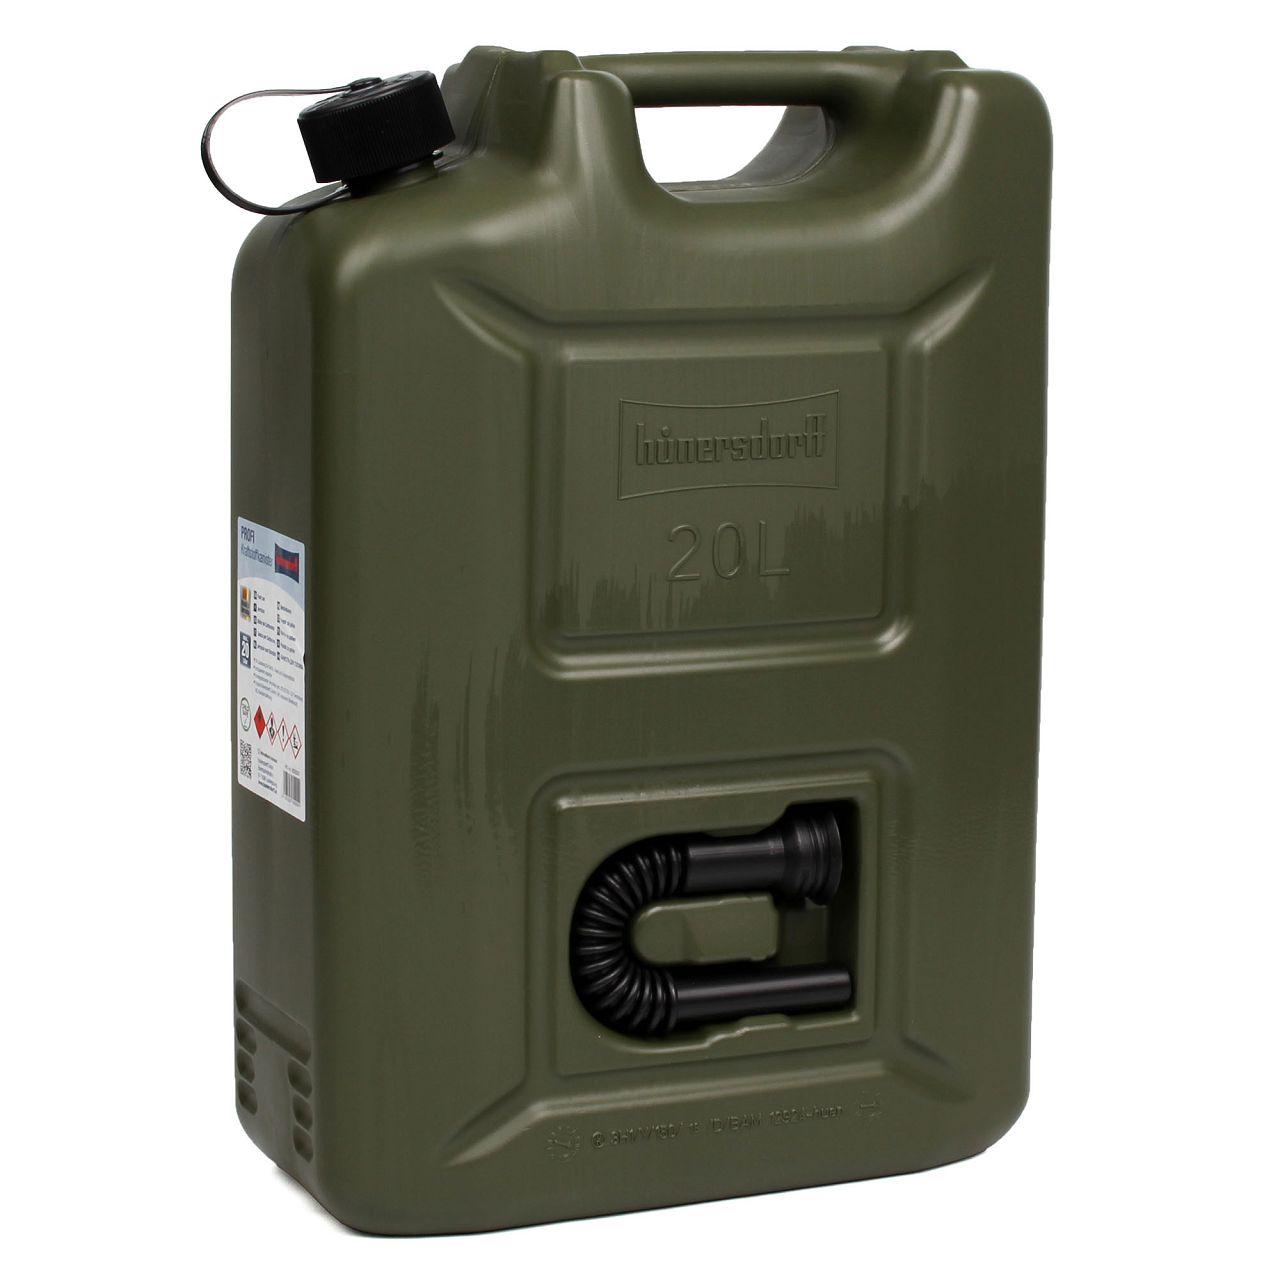 HÜNERSDORFF 802000 Kanister Benzinkanister Reservekanister PROFI 20 L Nato-oliv